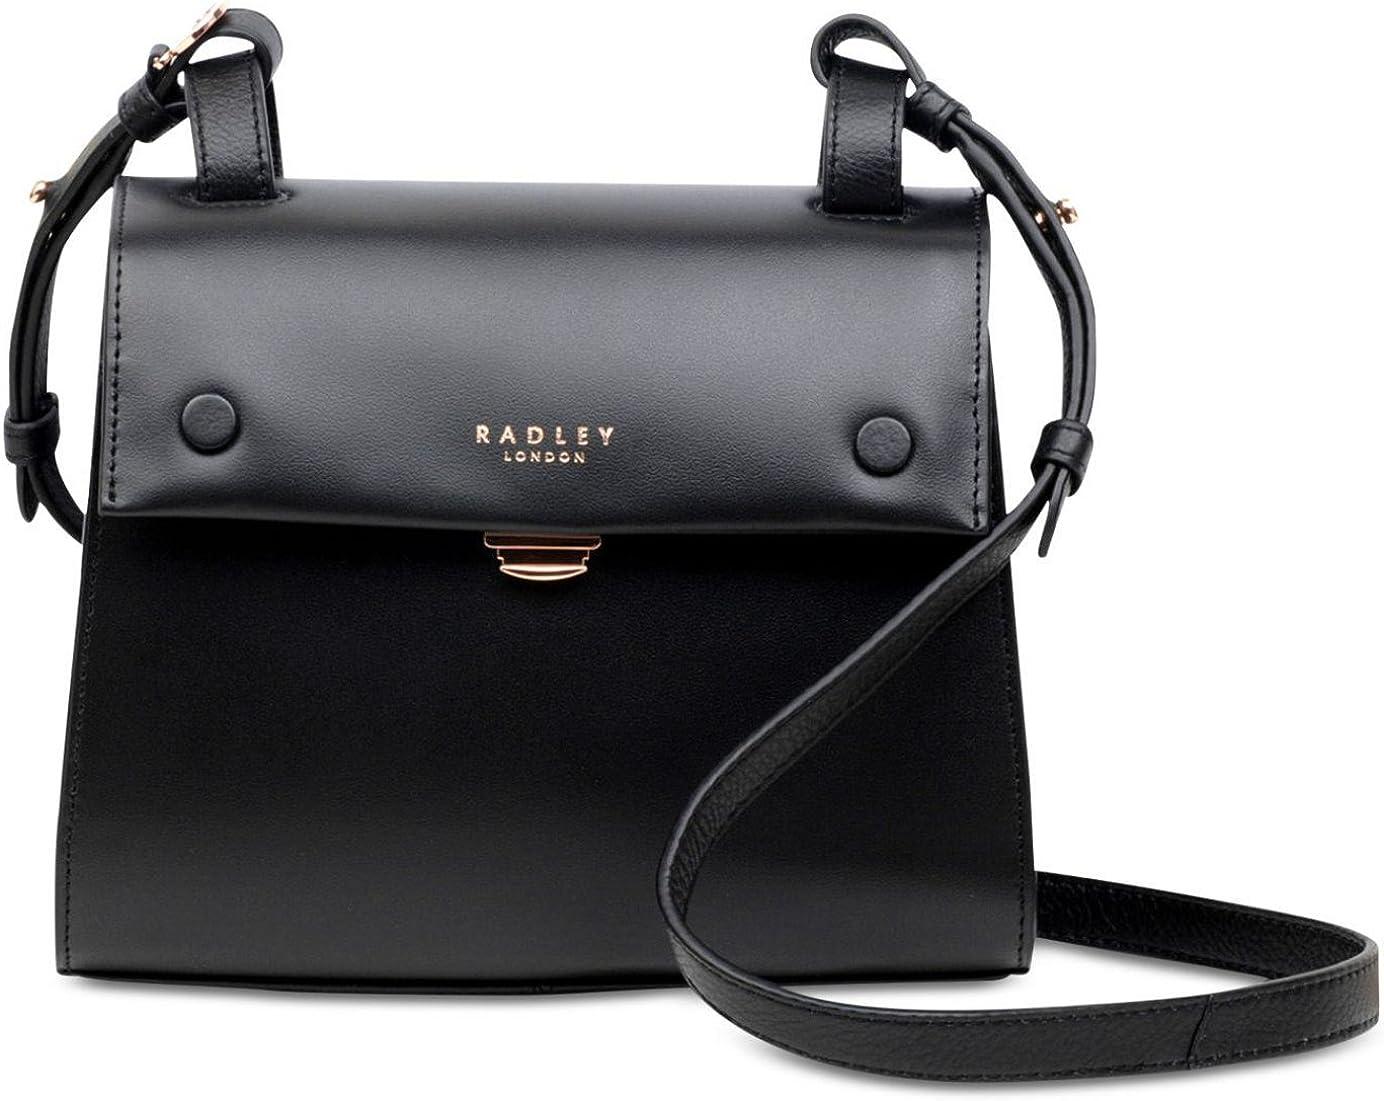 Radley London Lavender Gardens Small Leather Flapover Bag Black